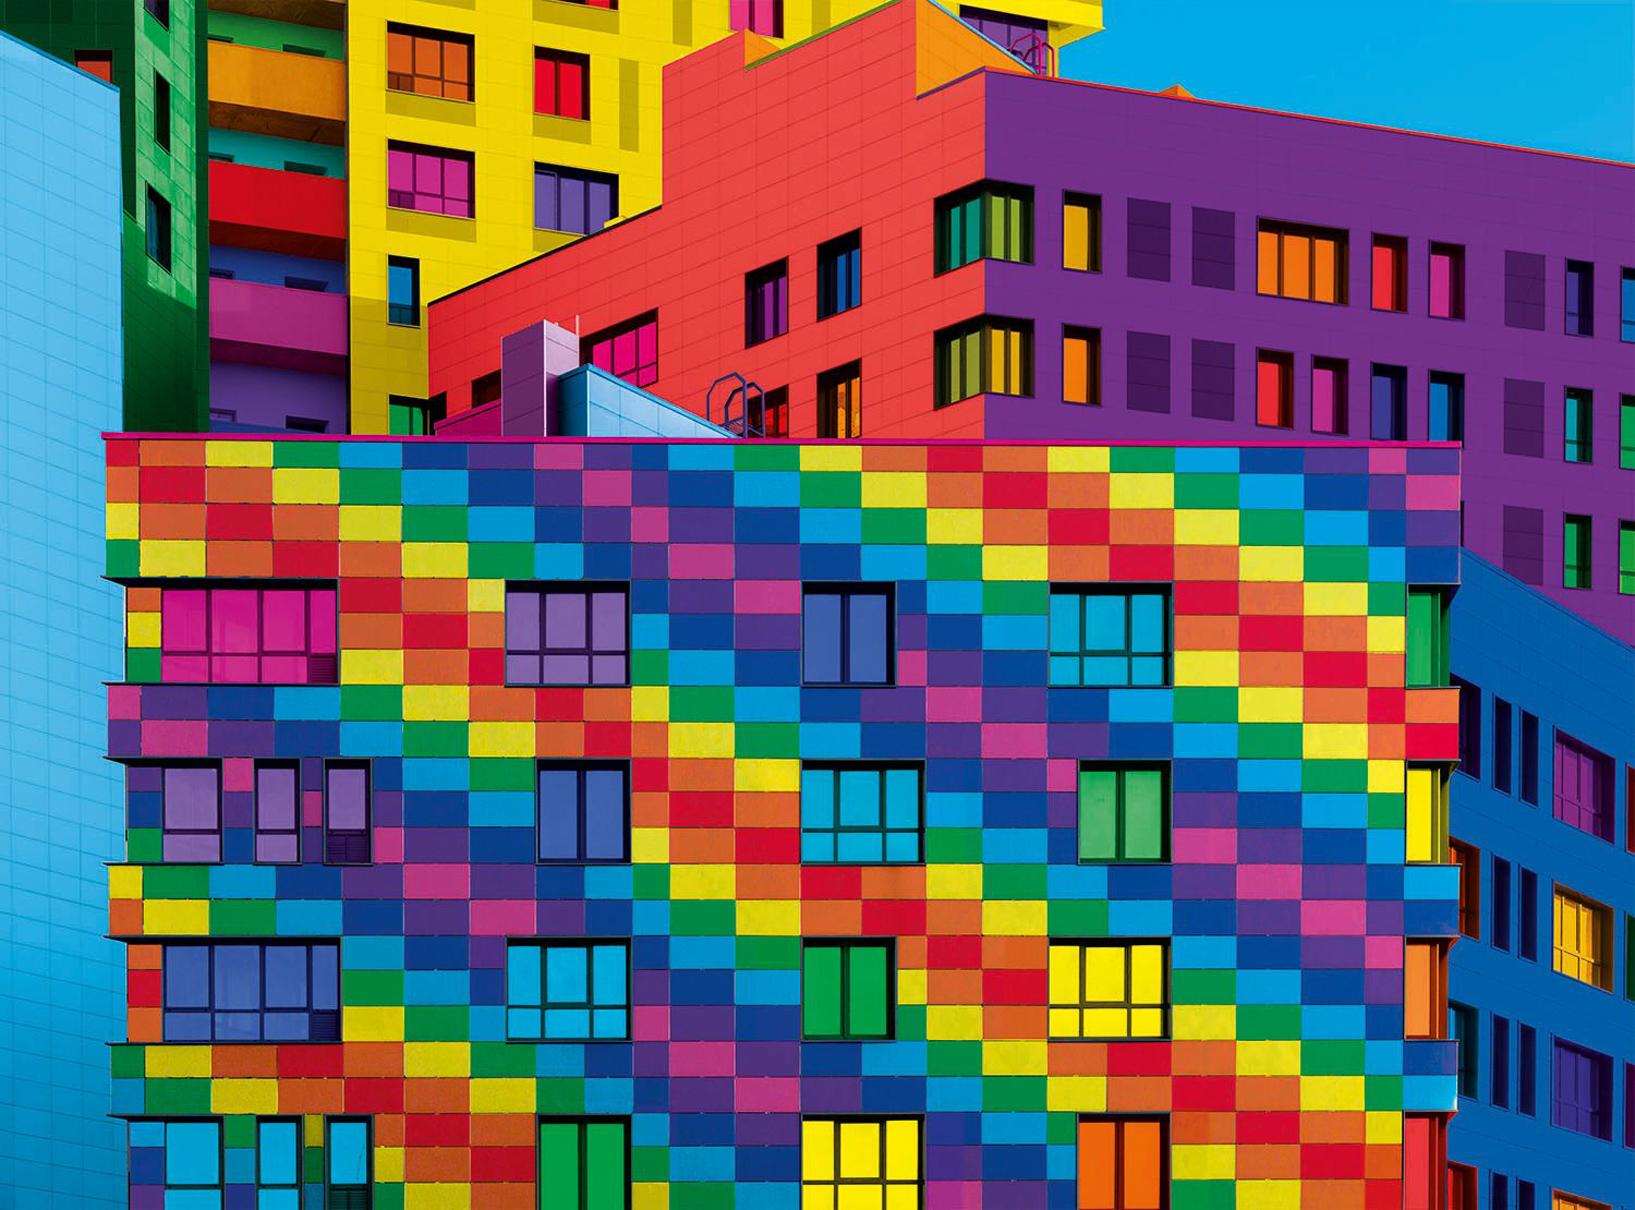 Squares Graphics / Illustration Jigsaw Puzzle